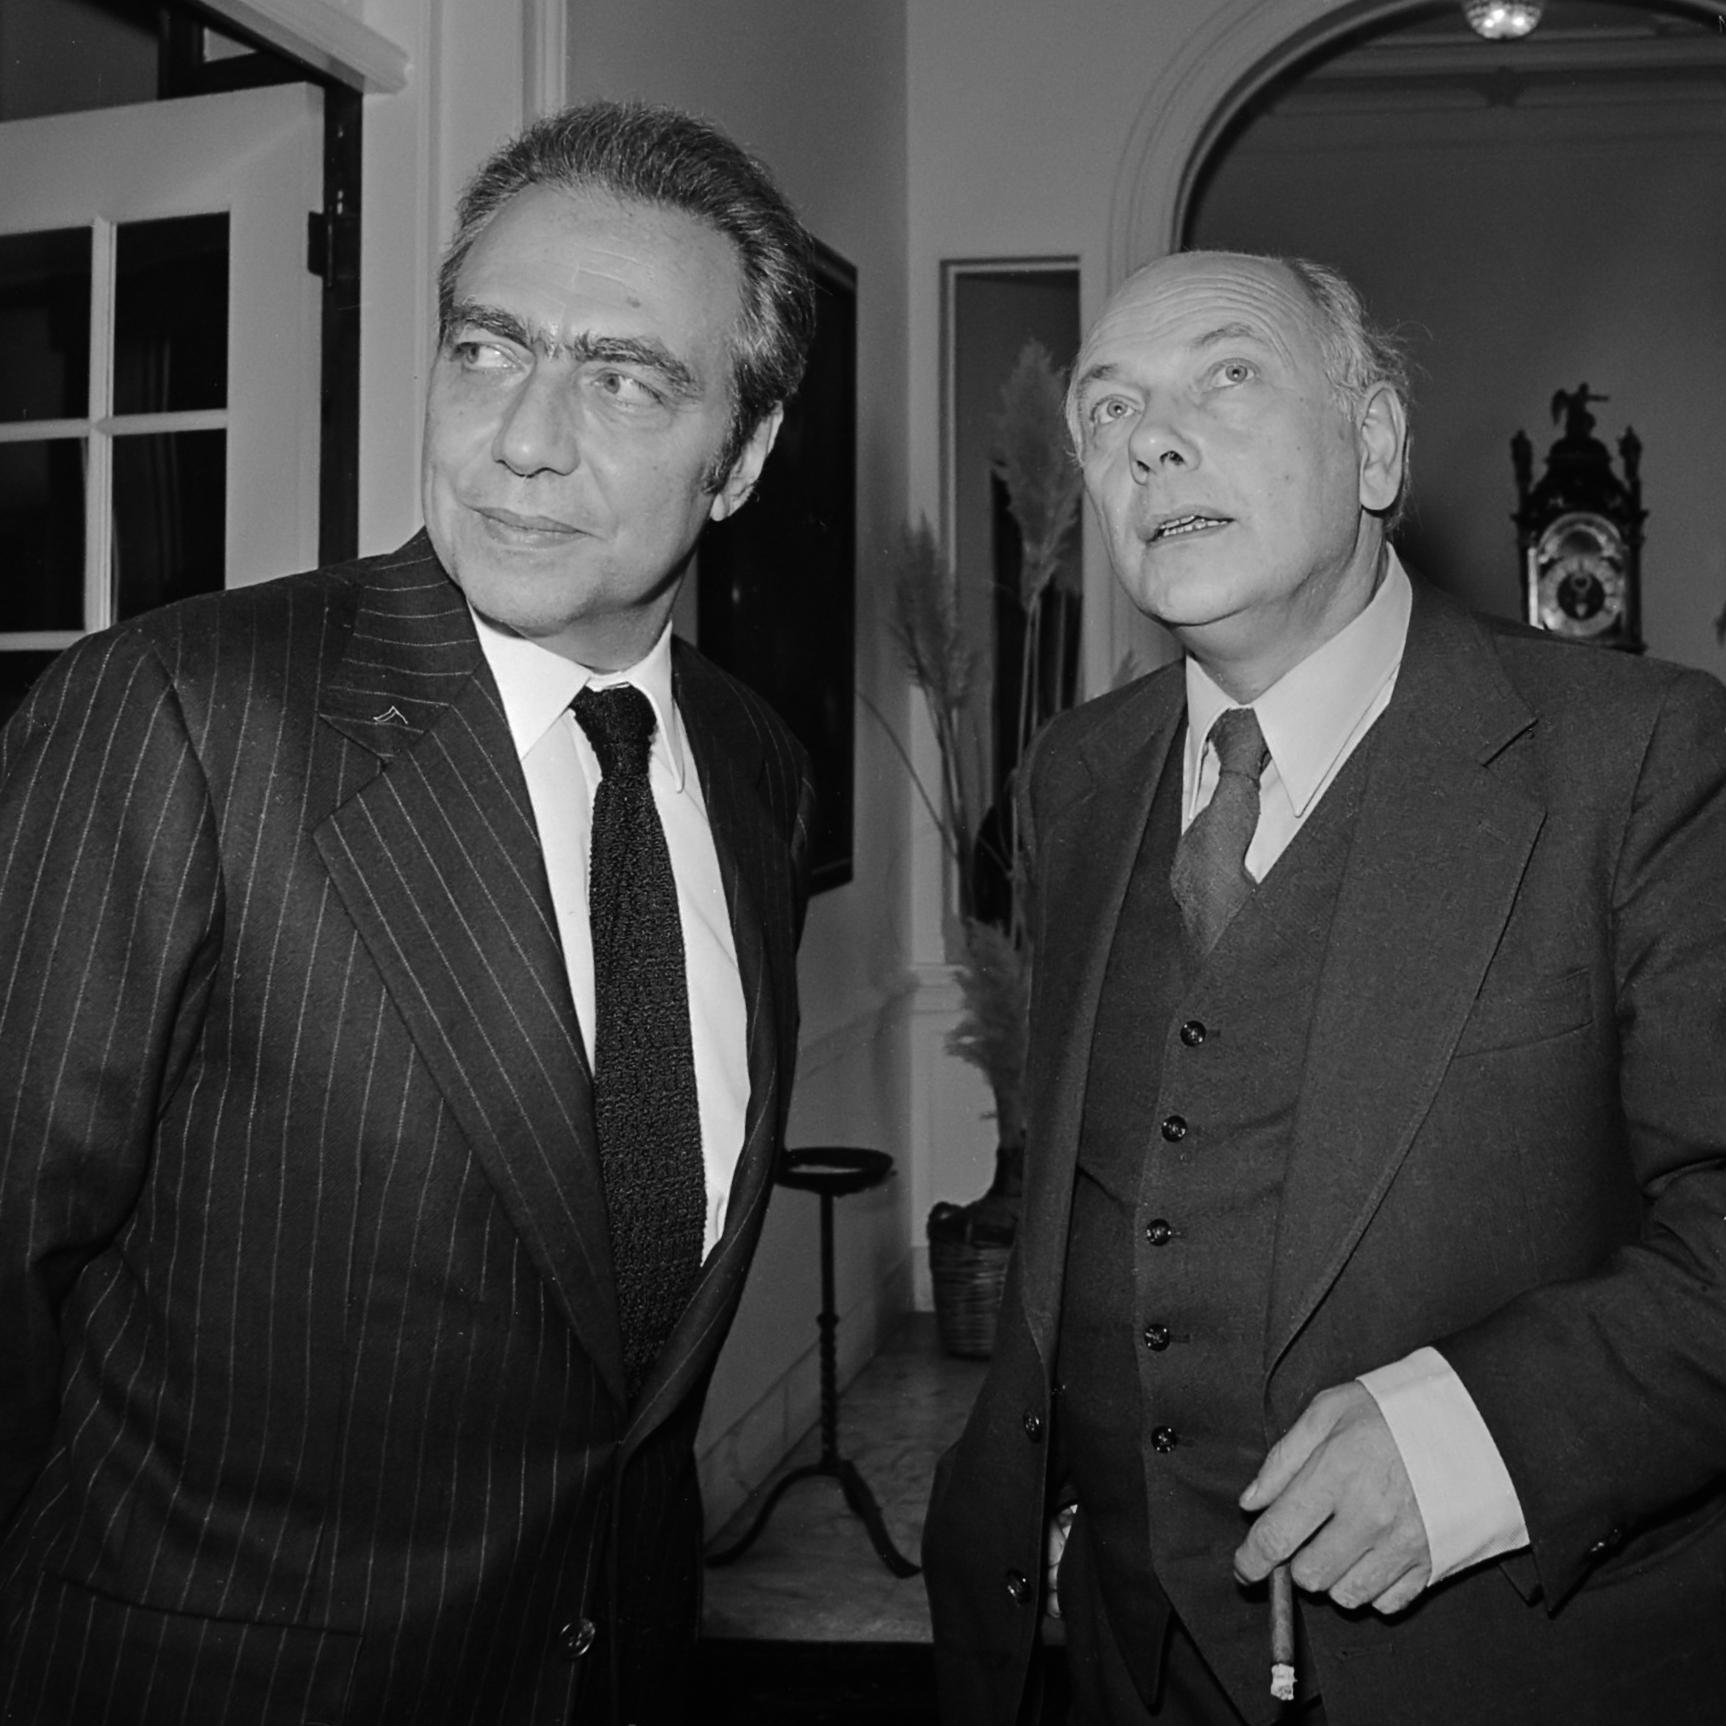 Citaten Joop Den Uyl : François xavier ortoli — wikipédia